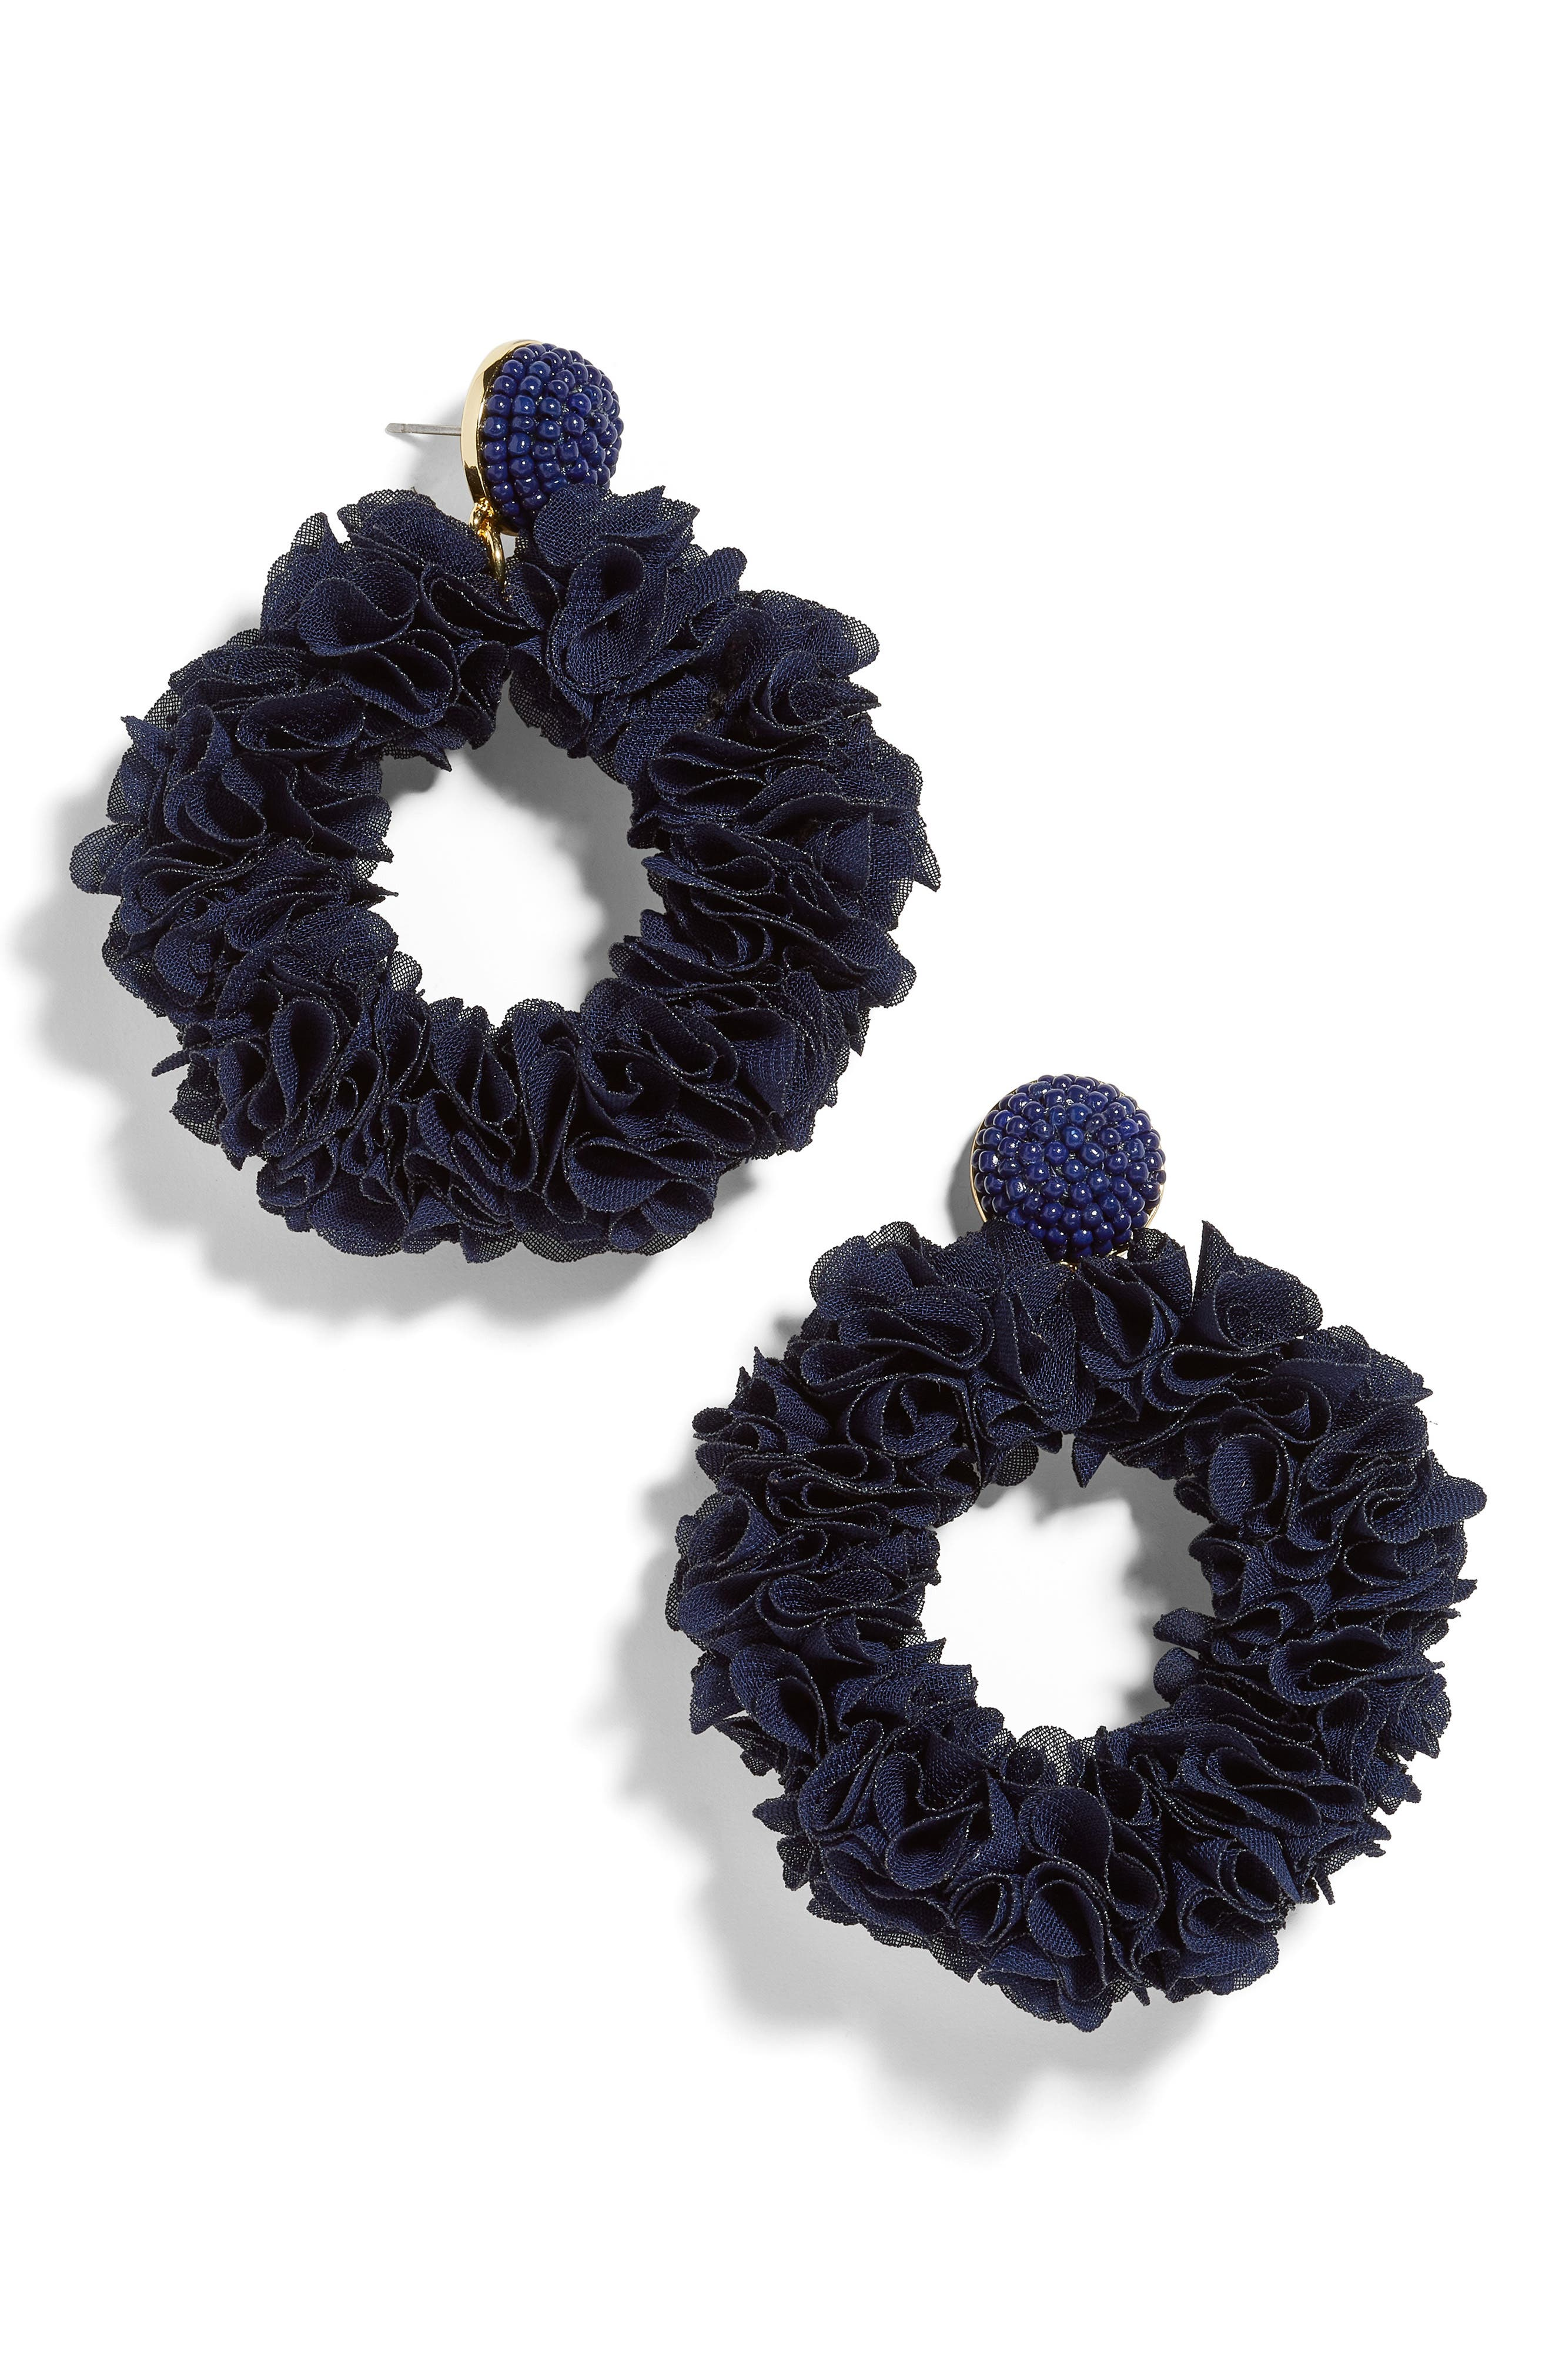 BAUBLEBAR, Camellia Floral Hoop Drop Earrings, Main thumbnail 1, color, NAVY